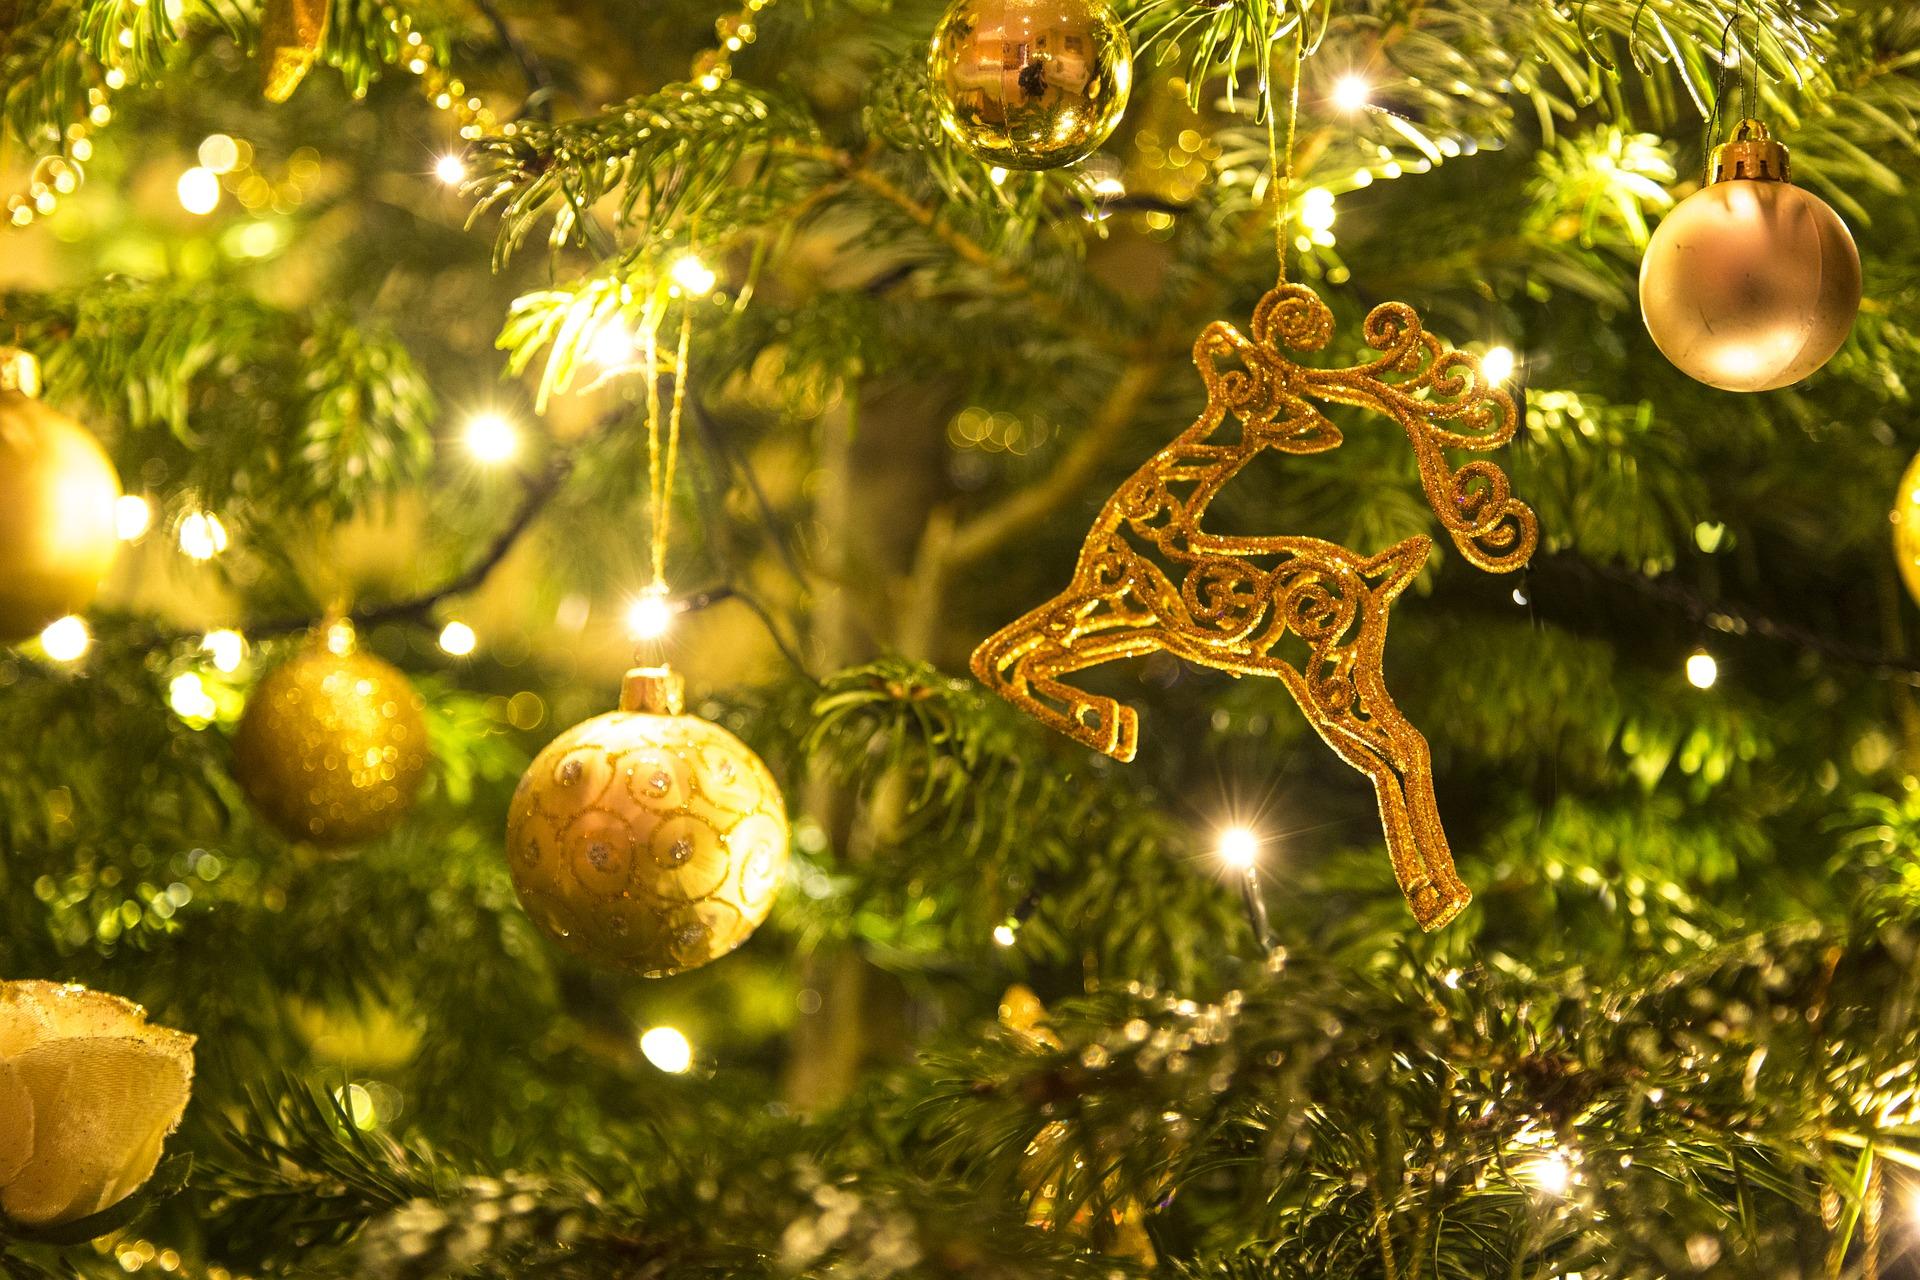 christmas-1849263_1920.jpg